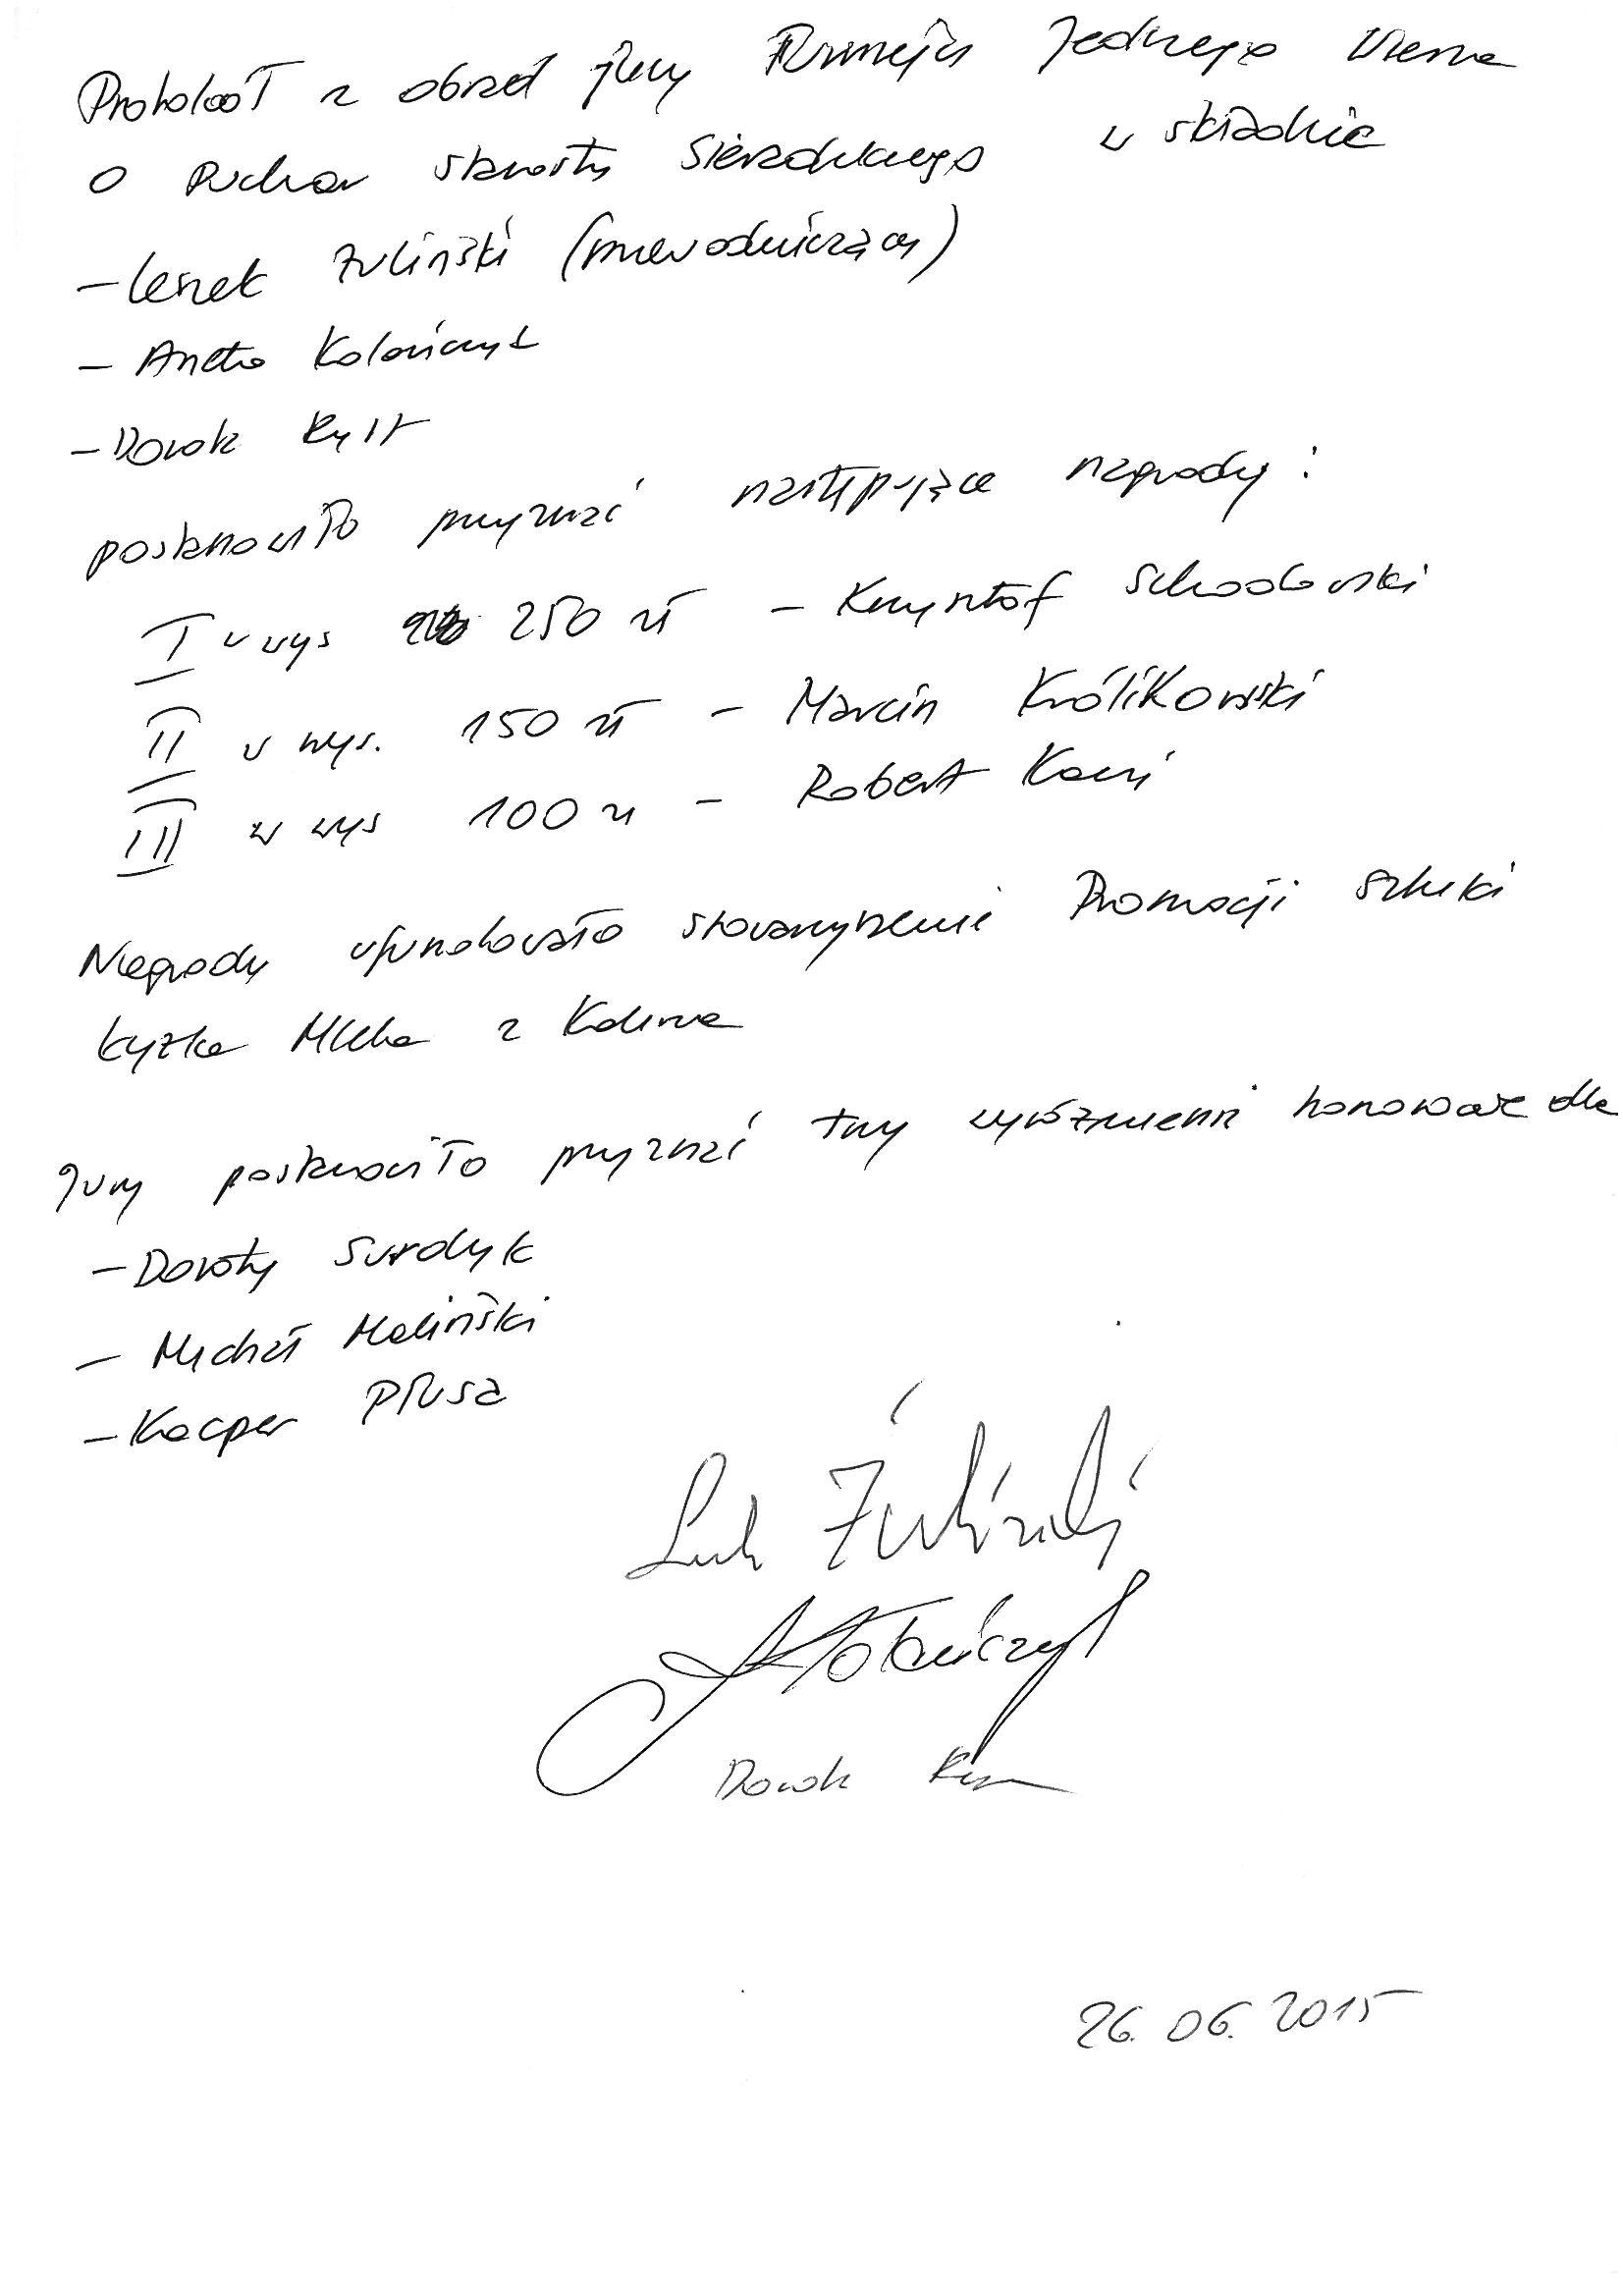 protokół jury29.06.2015